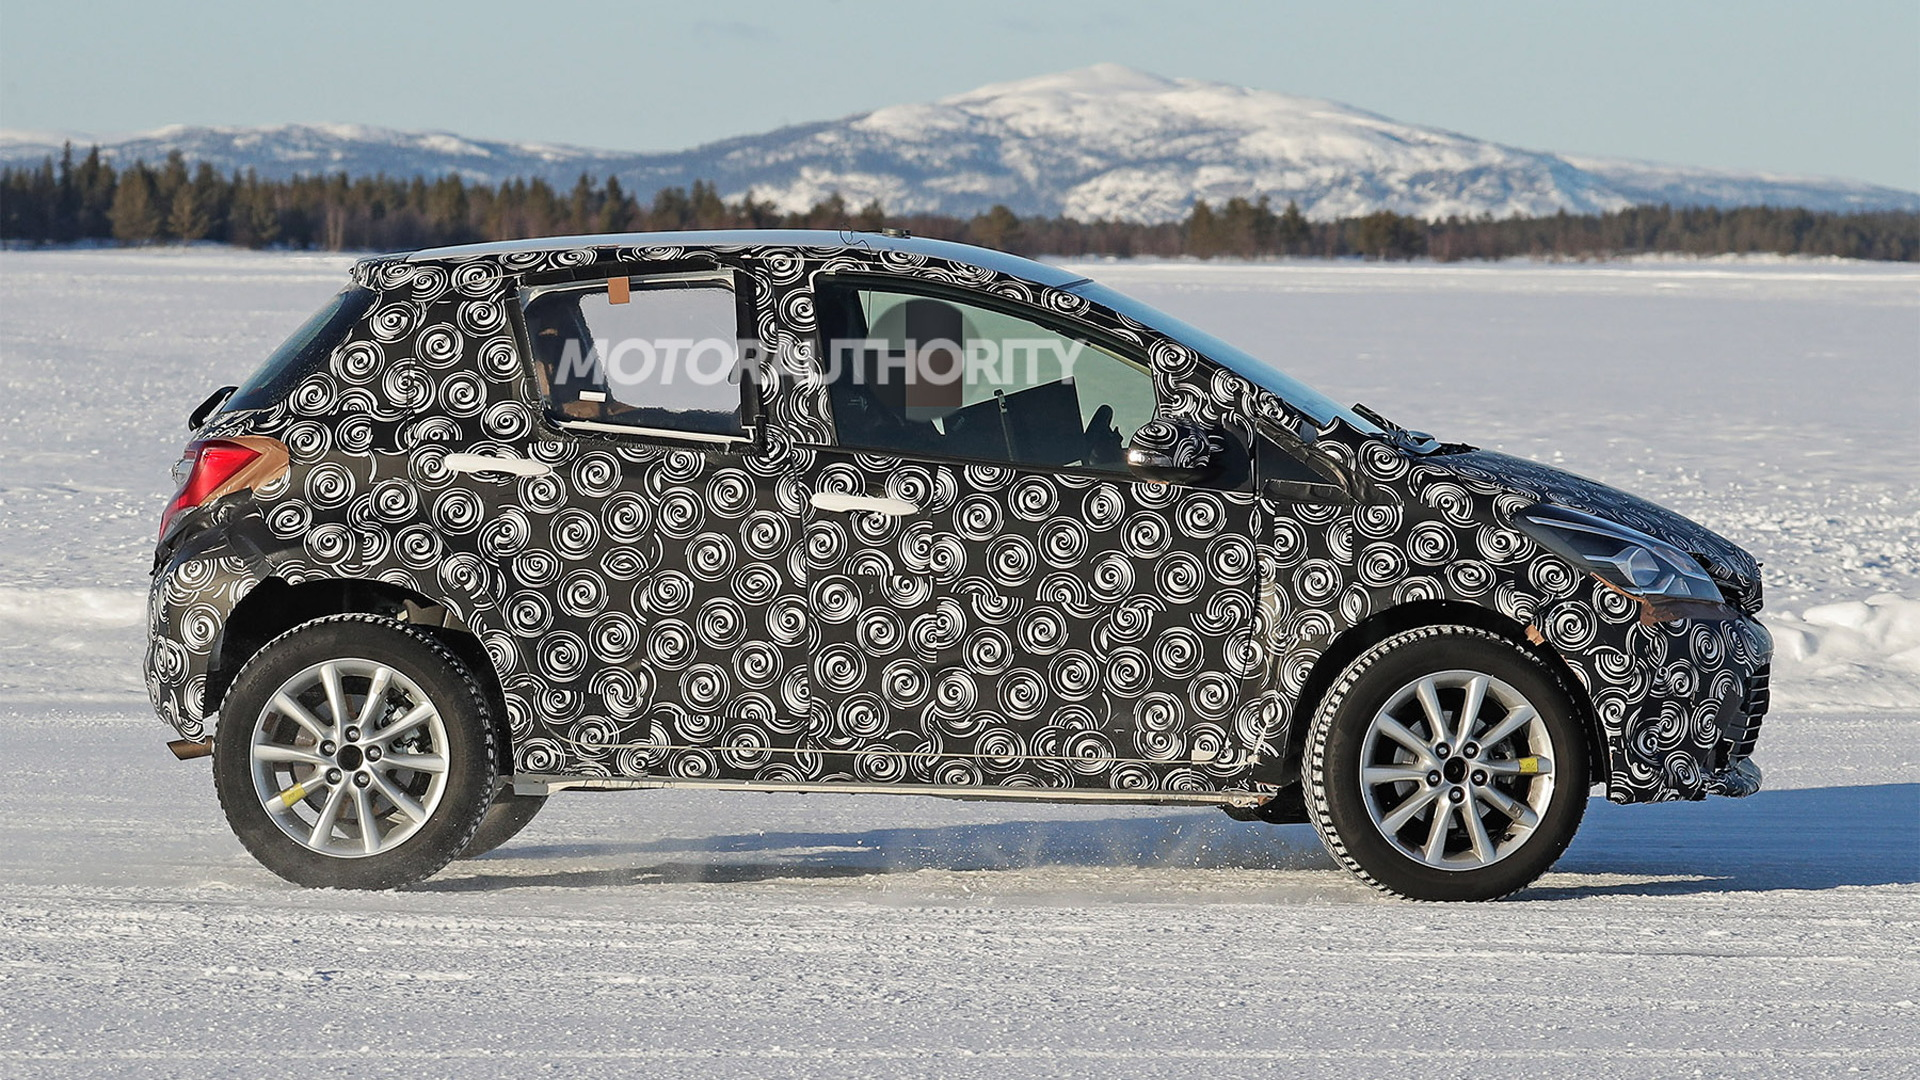 2022 Toyota subcompact crossover SUV spy shots - Photo credit:S. Baldauf/SB-Medien